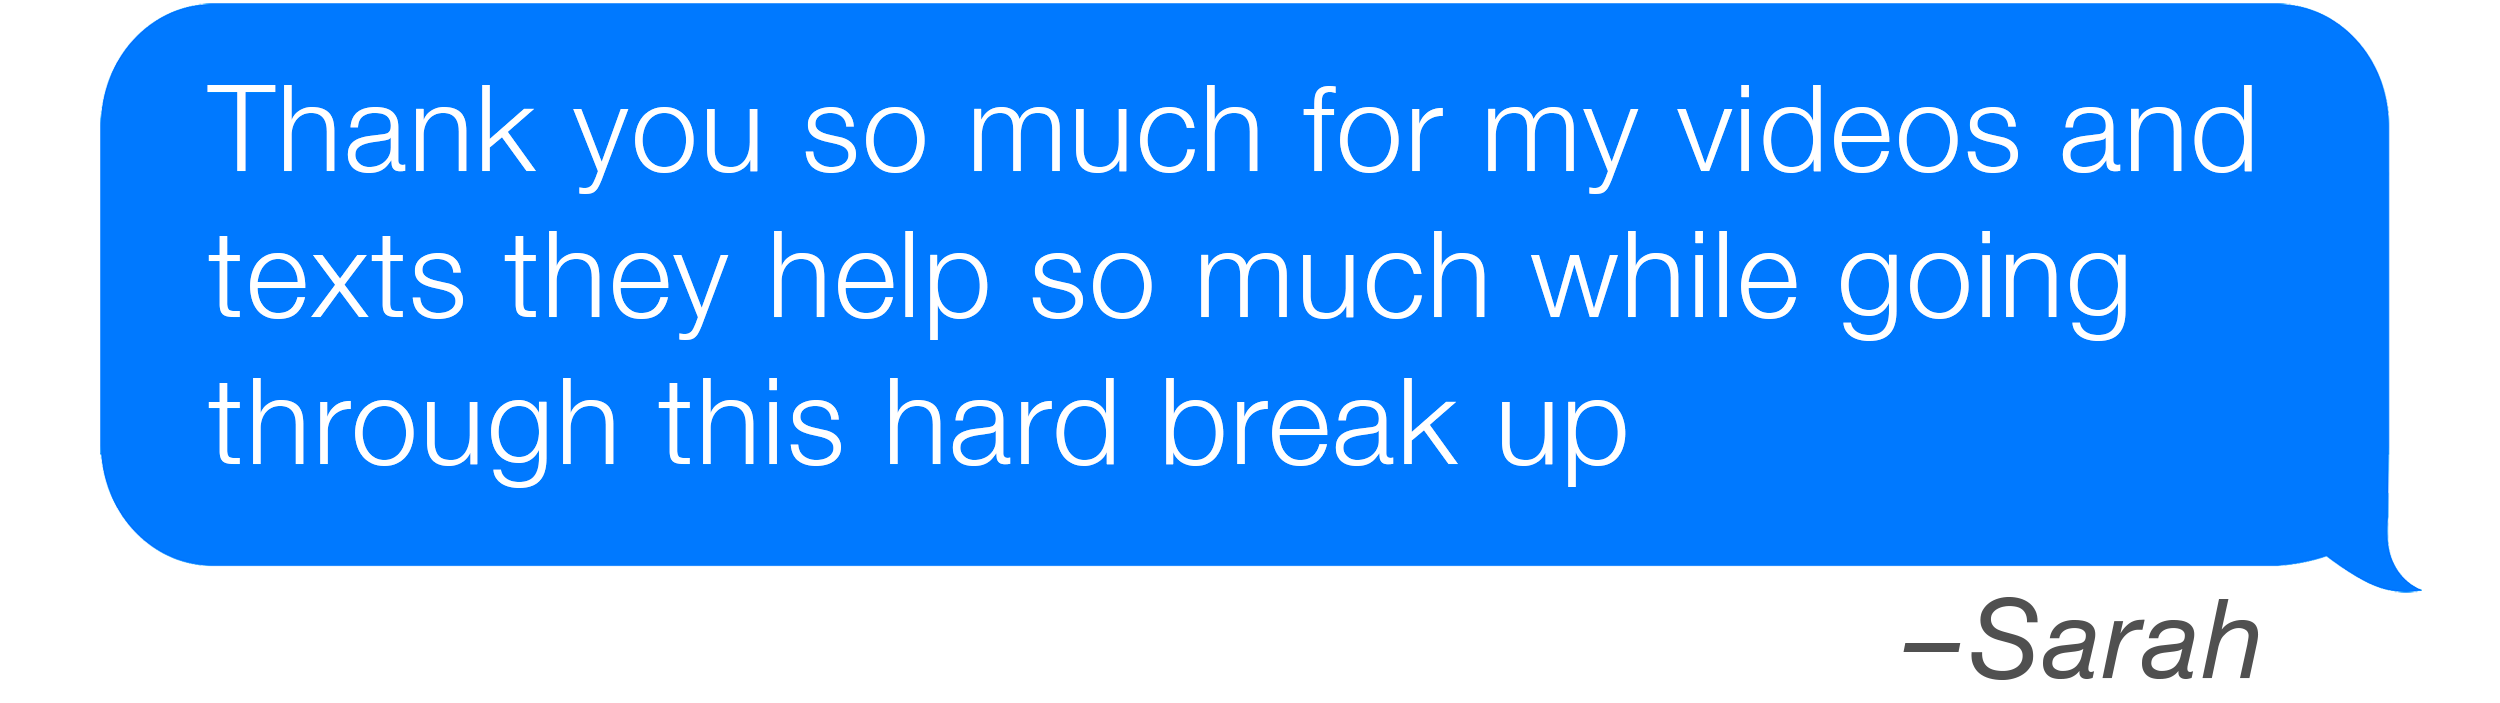 Going through a hard breakup